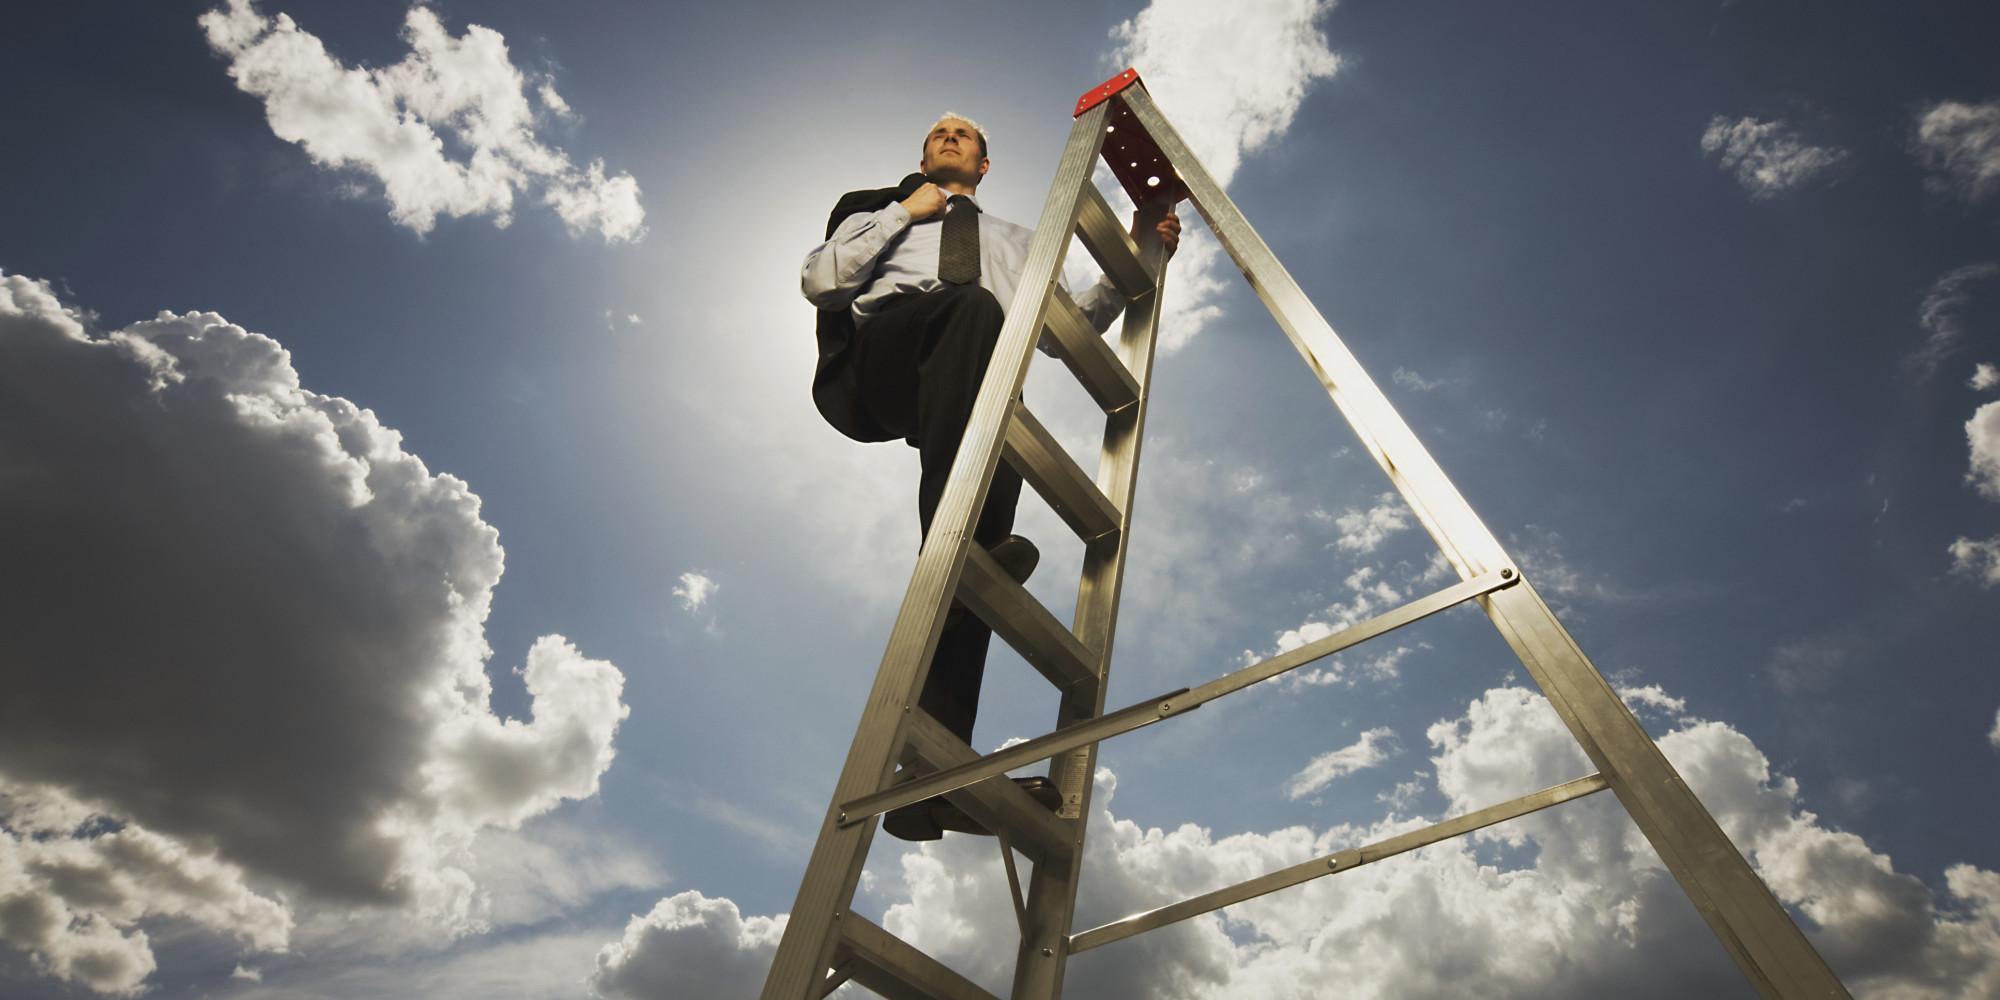 Climbing corporate ladder Free Photo